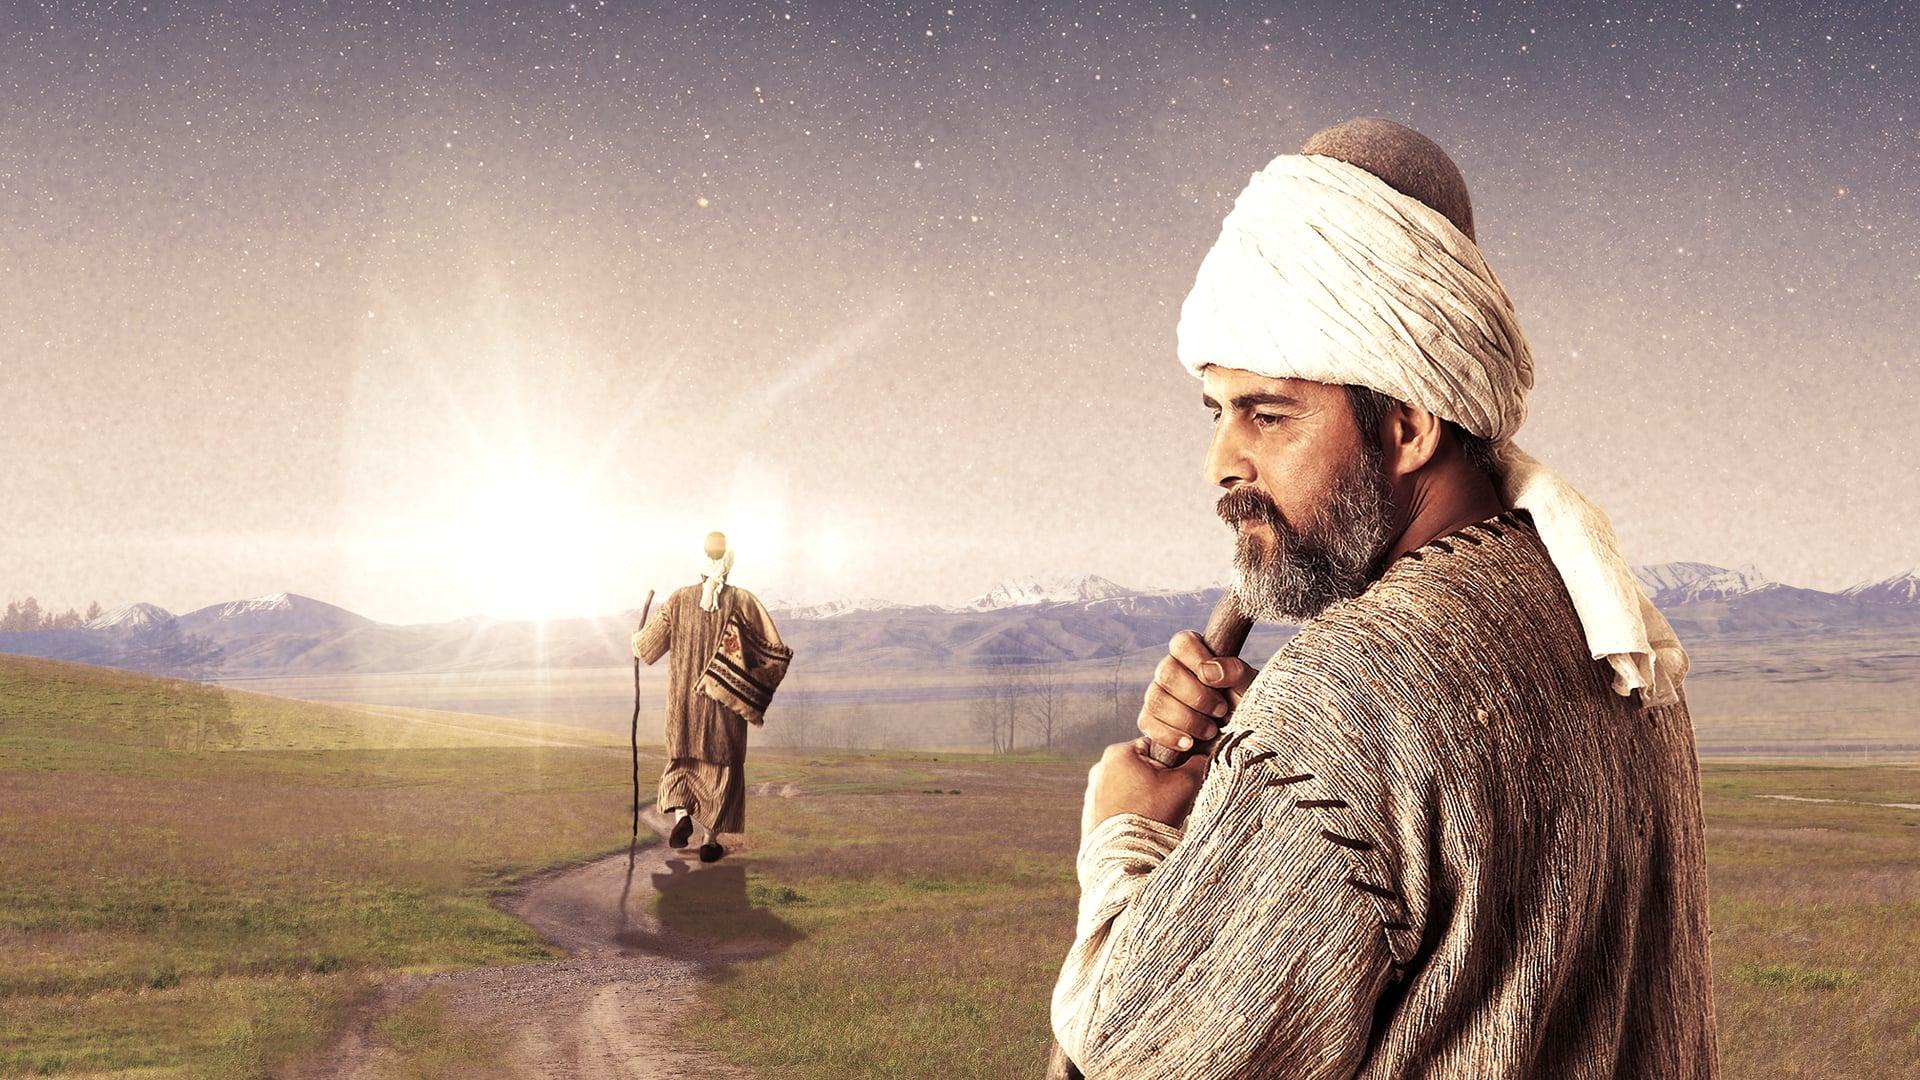 After Dirilis Ertugrul Imran Khan Wants You To Watch Another Turkish Drama The Express Tribune